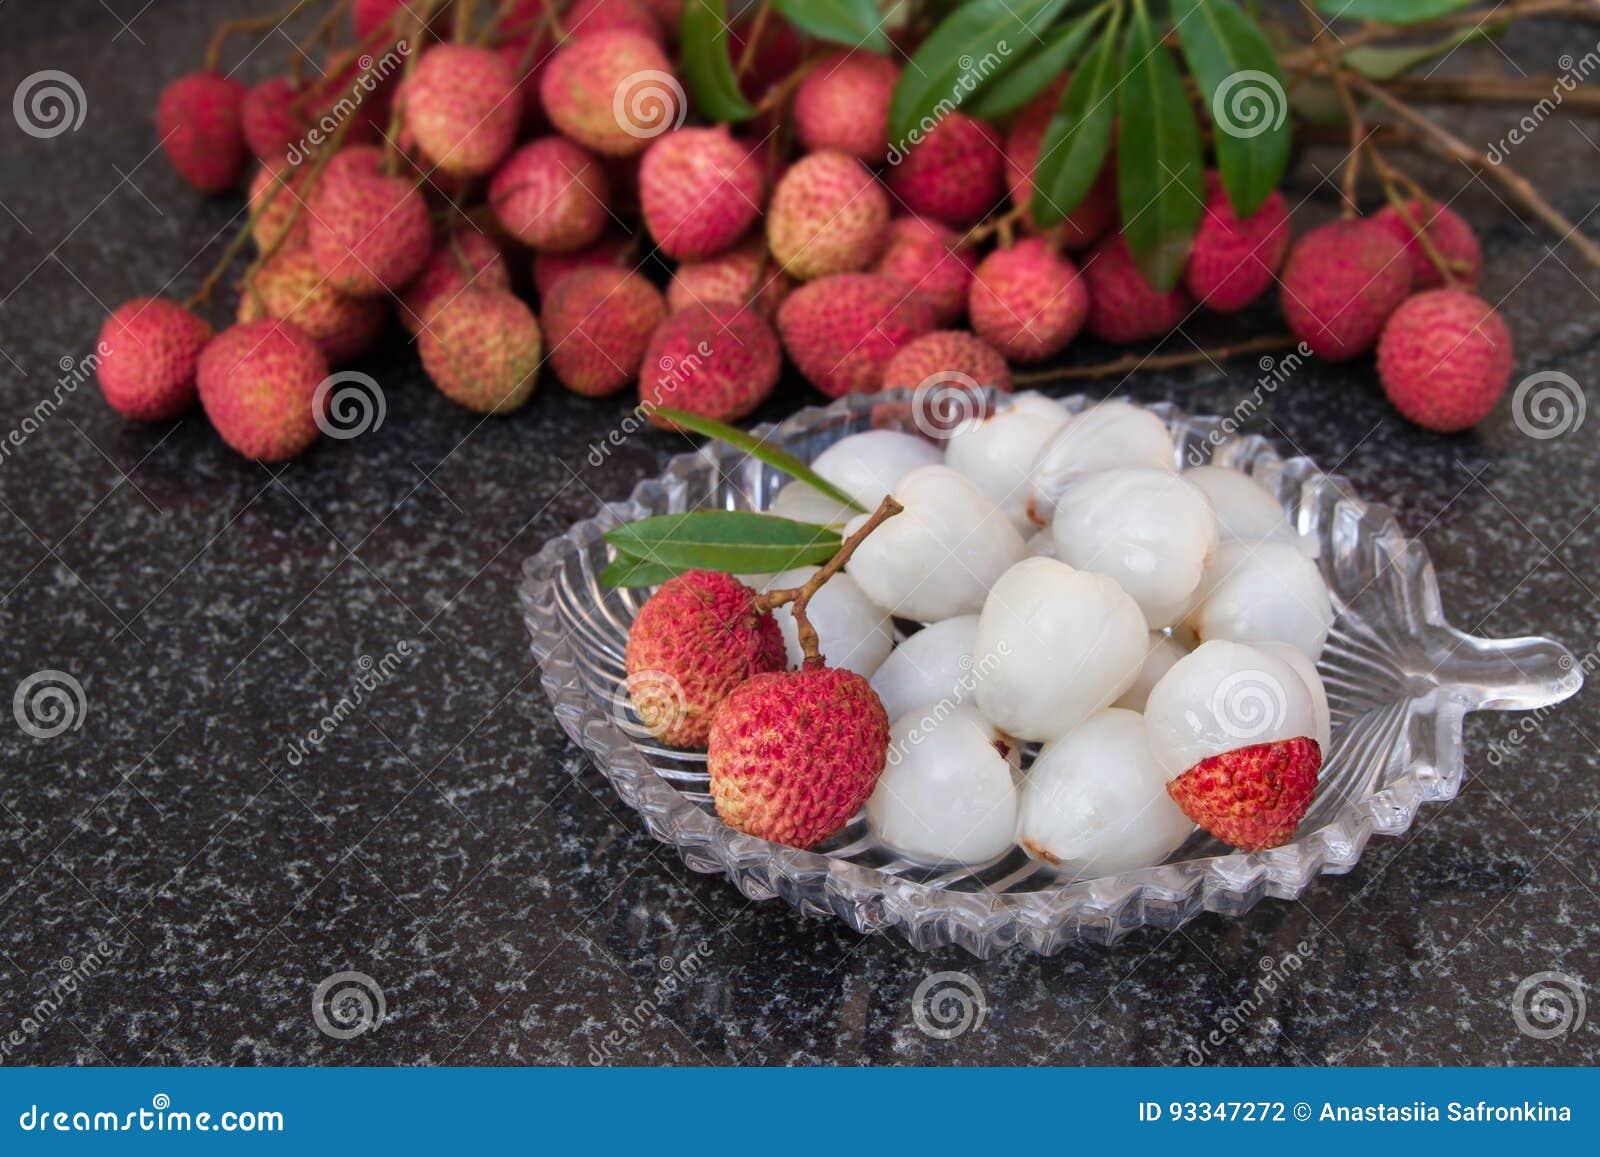 Frutas del lichí Fruta jugosa fresca del lichi en una placa de cristal Fruta pelada del lichi